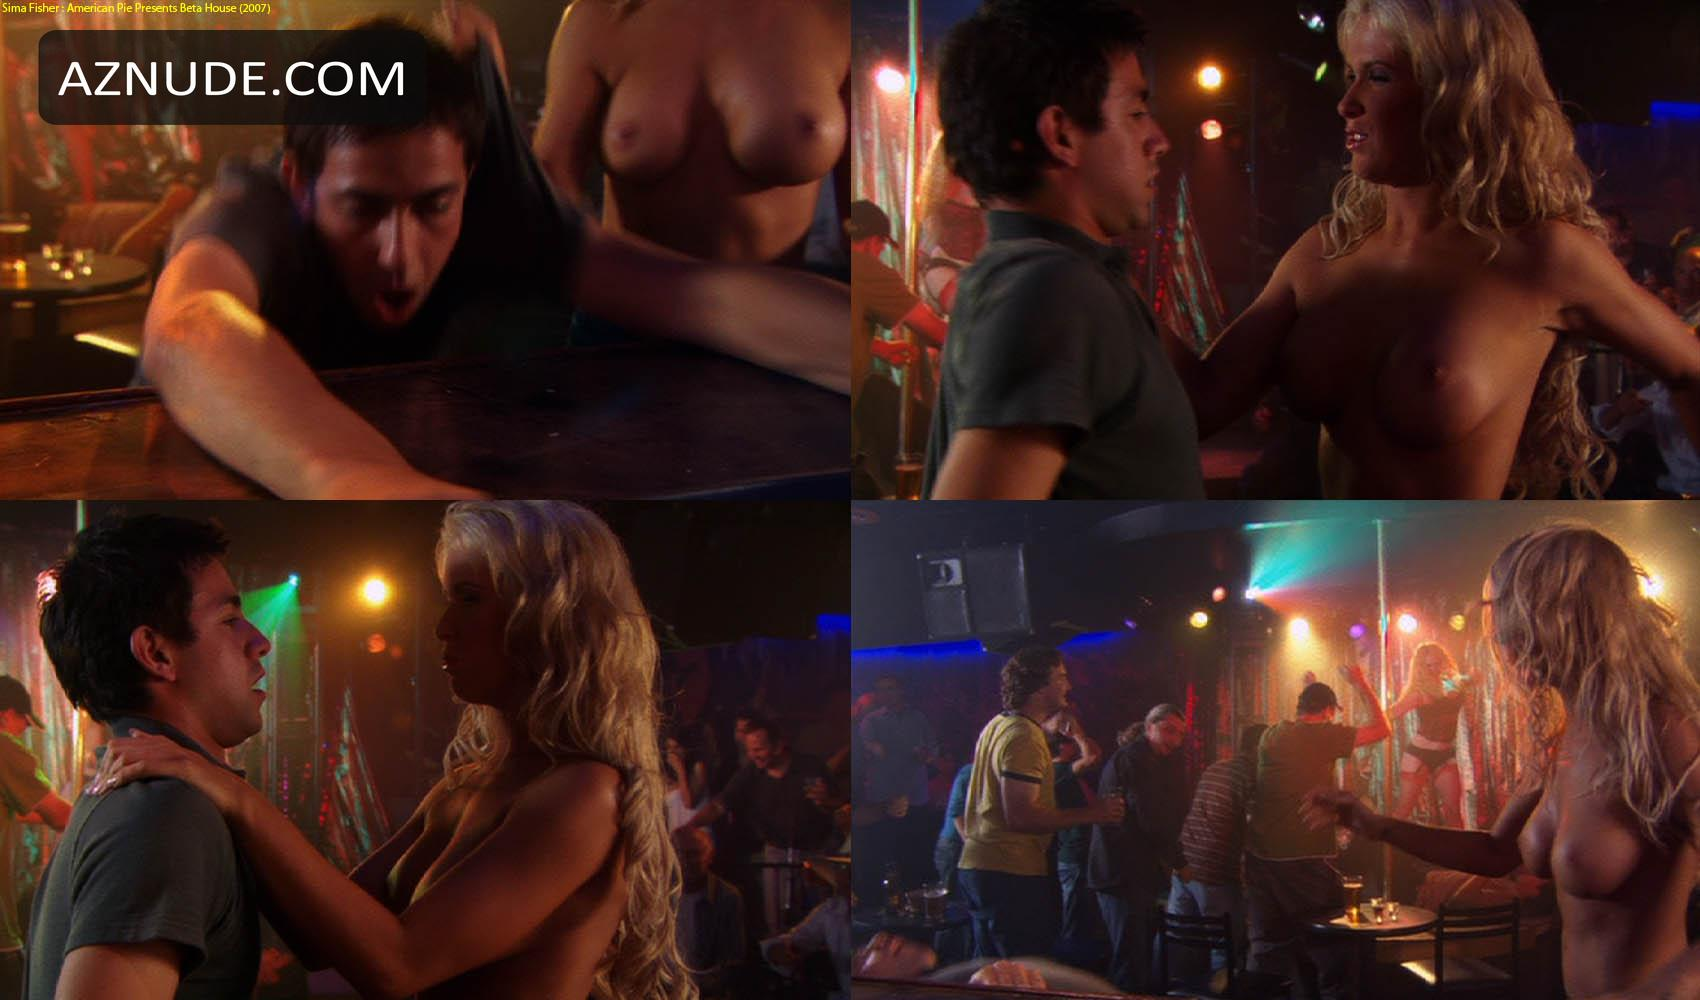 American Pie Presents Beta House Sex Scene american pie presents beta house nude scenes - aznude